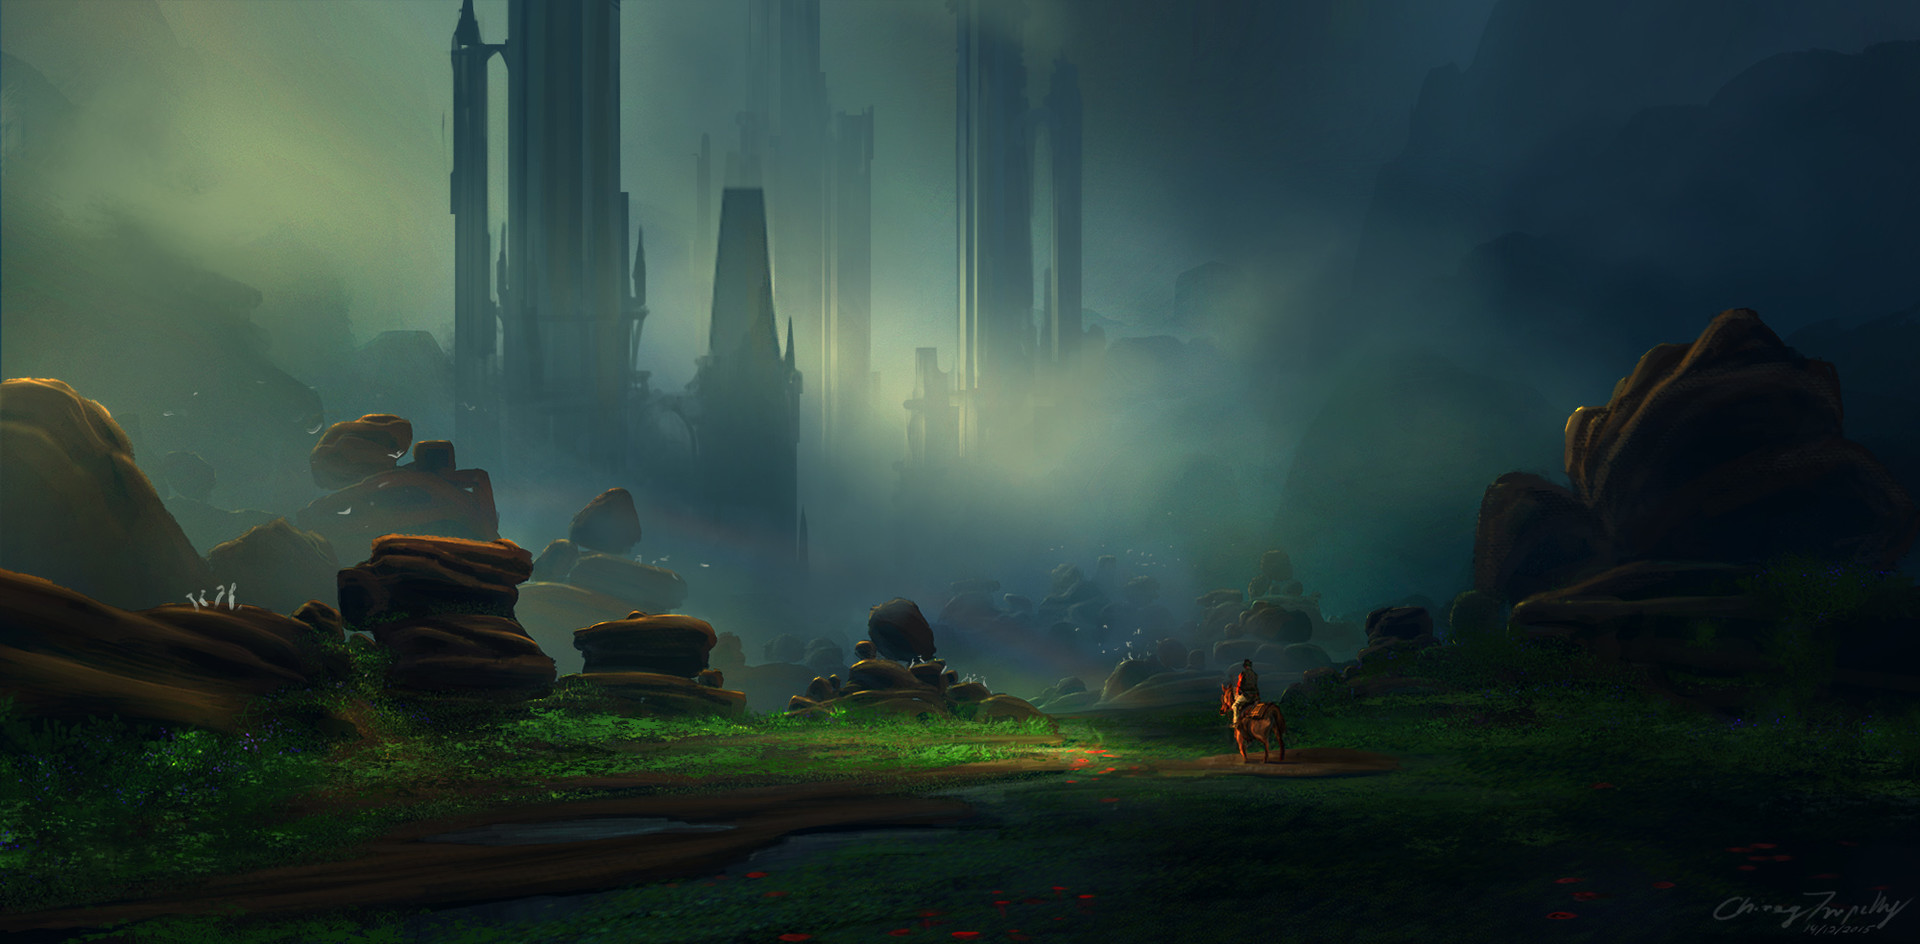 Chirag tripathy hidden castles 2